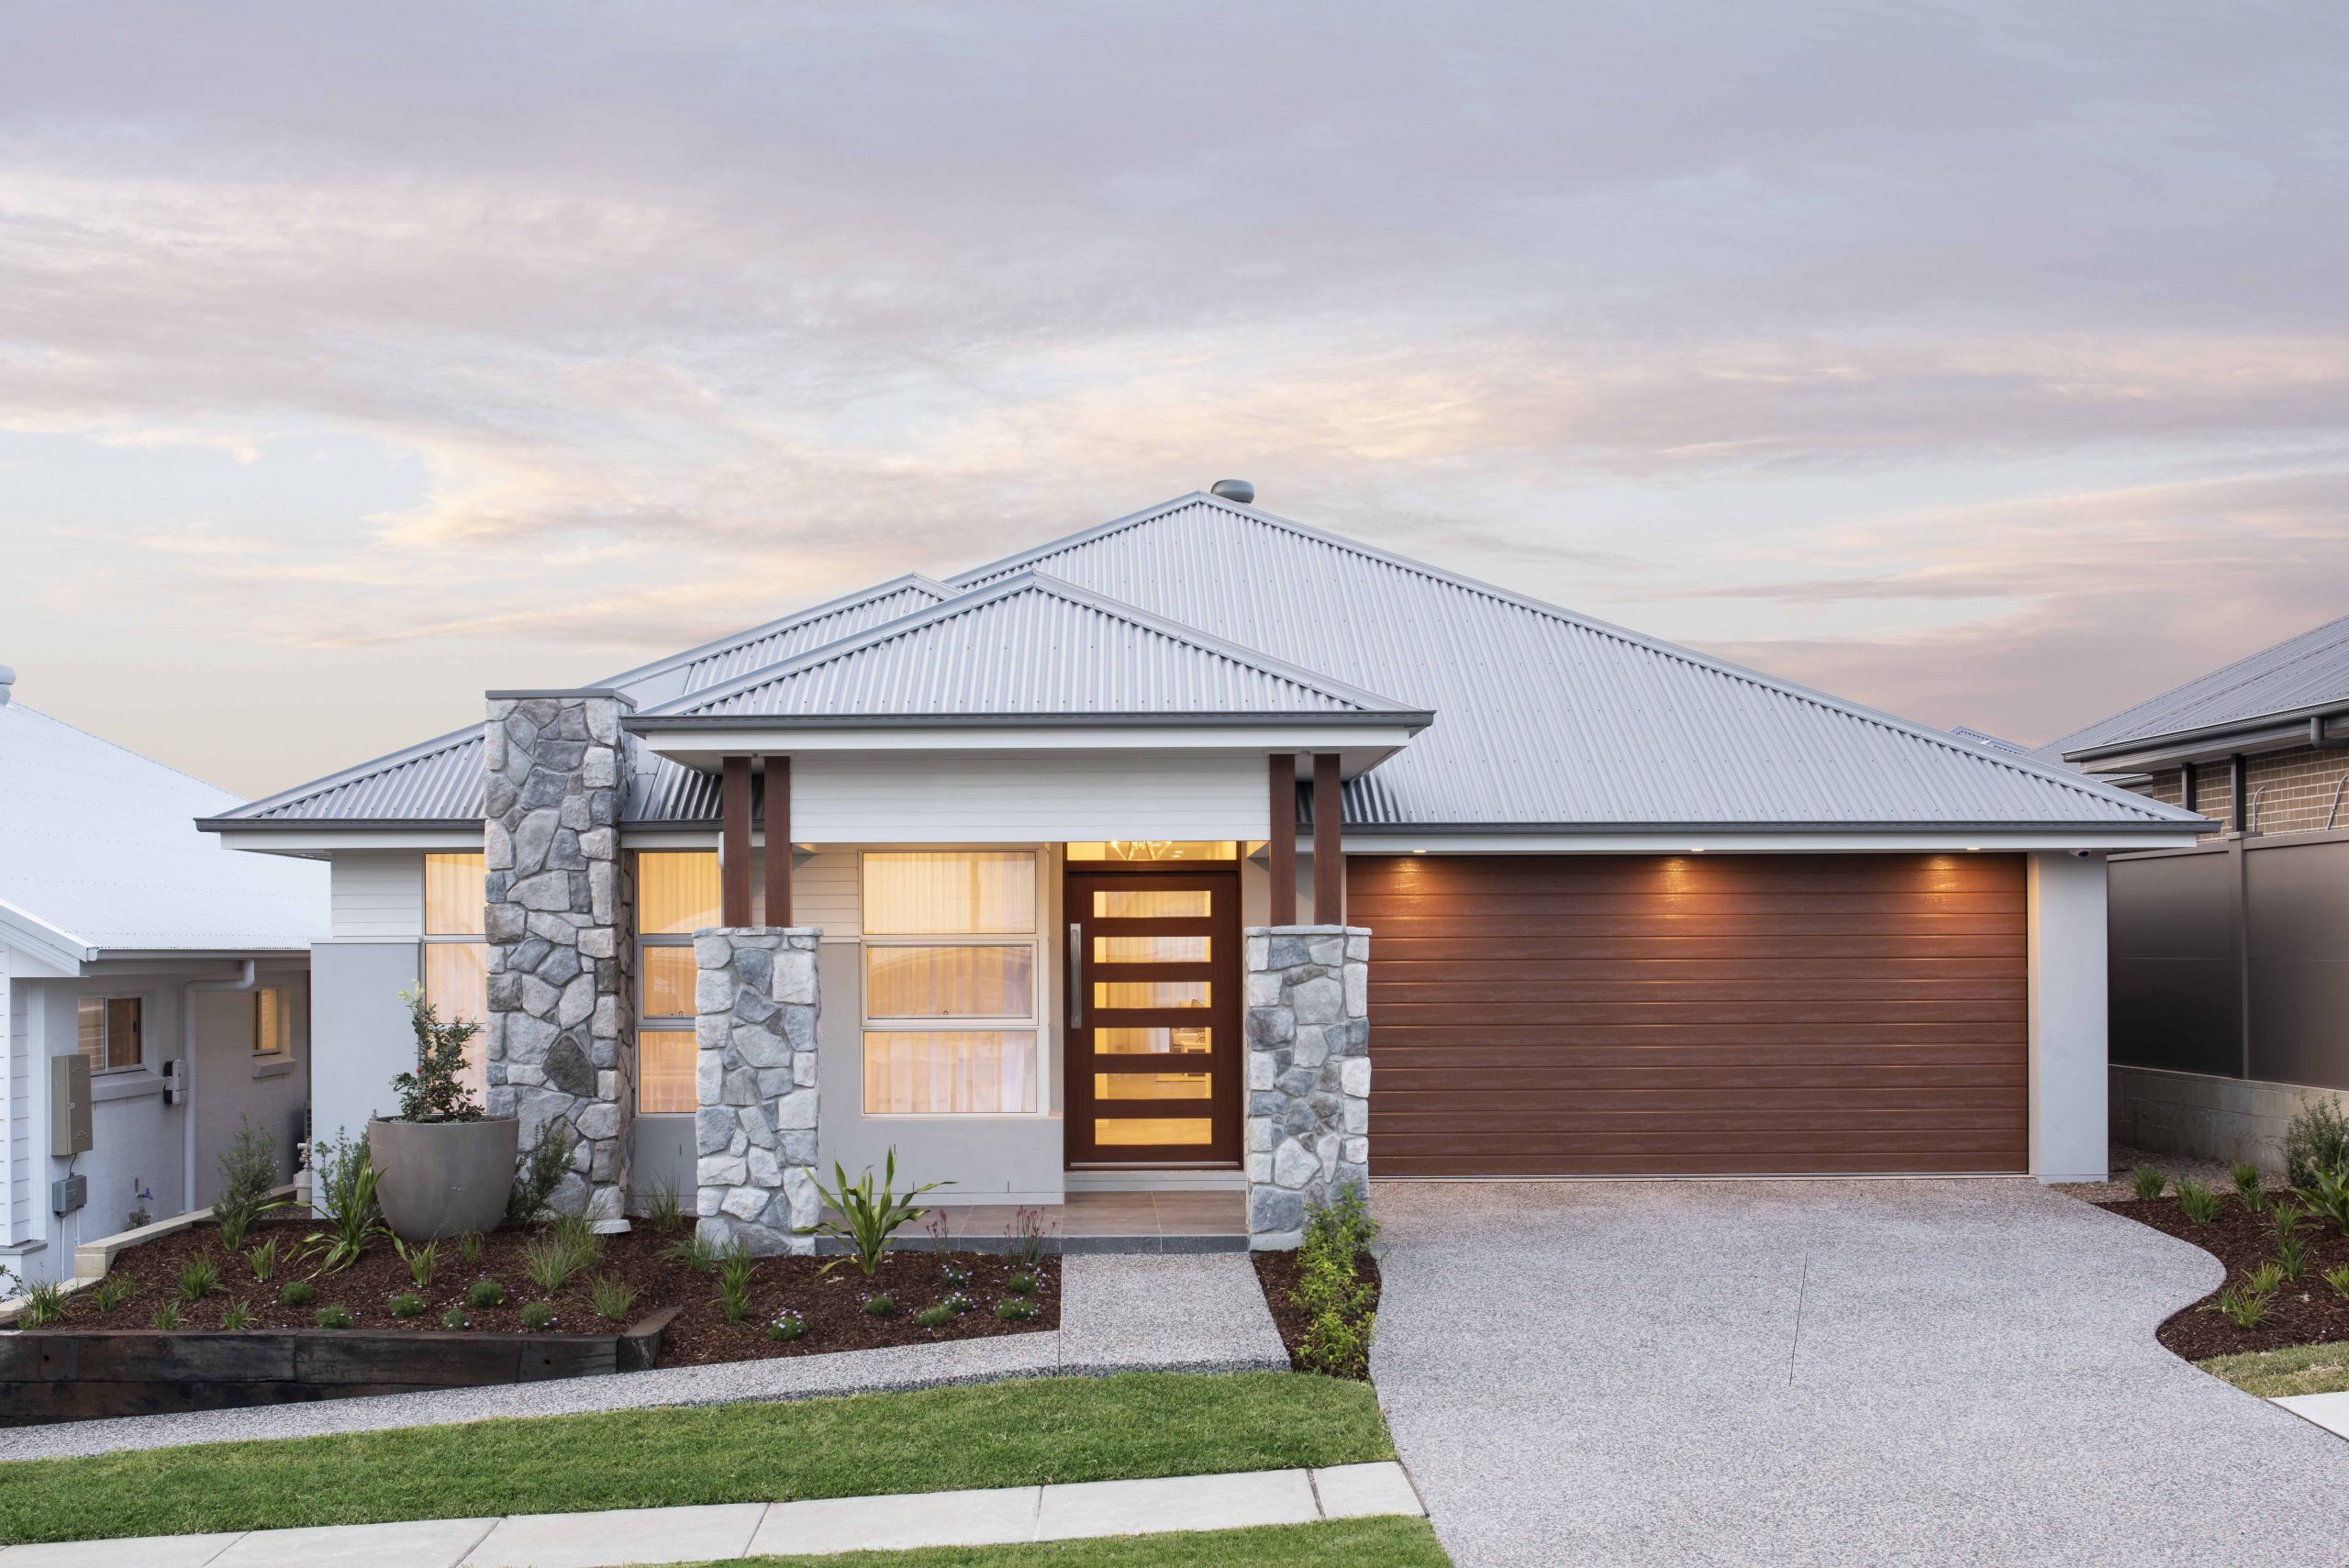 "<u><a href=""https://www.montgomeryhomes.com.au/display-home/avalon-220-display-home-in-huntlee-montgomery-homes/"">Avalon 220 </a></u>"